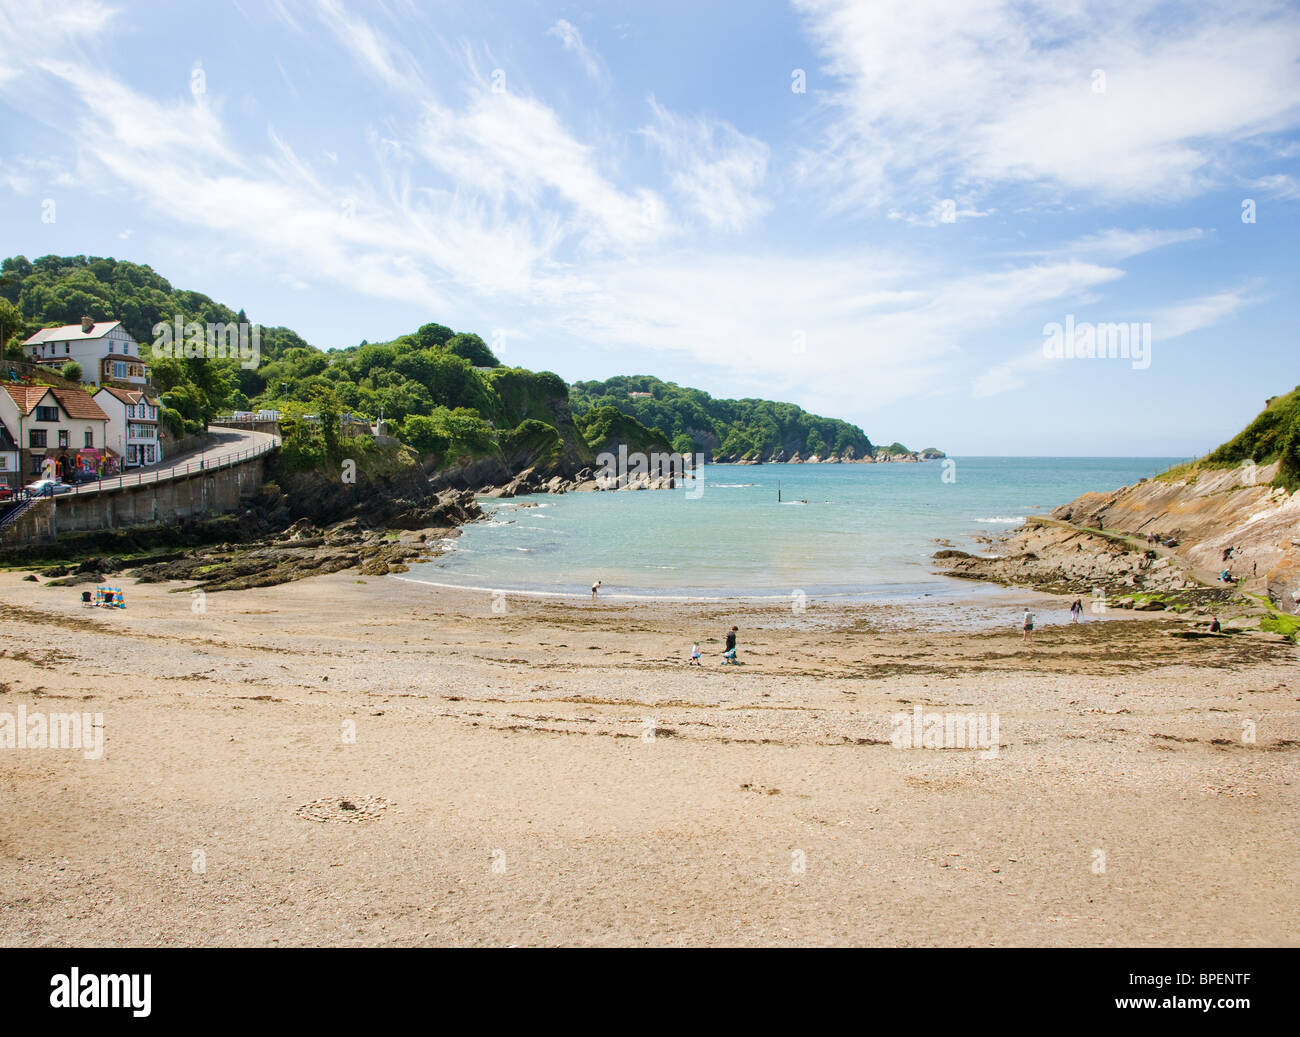 Beach At Combe Martin Seaside Resort Near Ilfracombe On The North Devon Coast